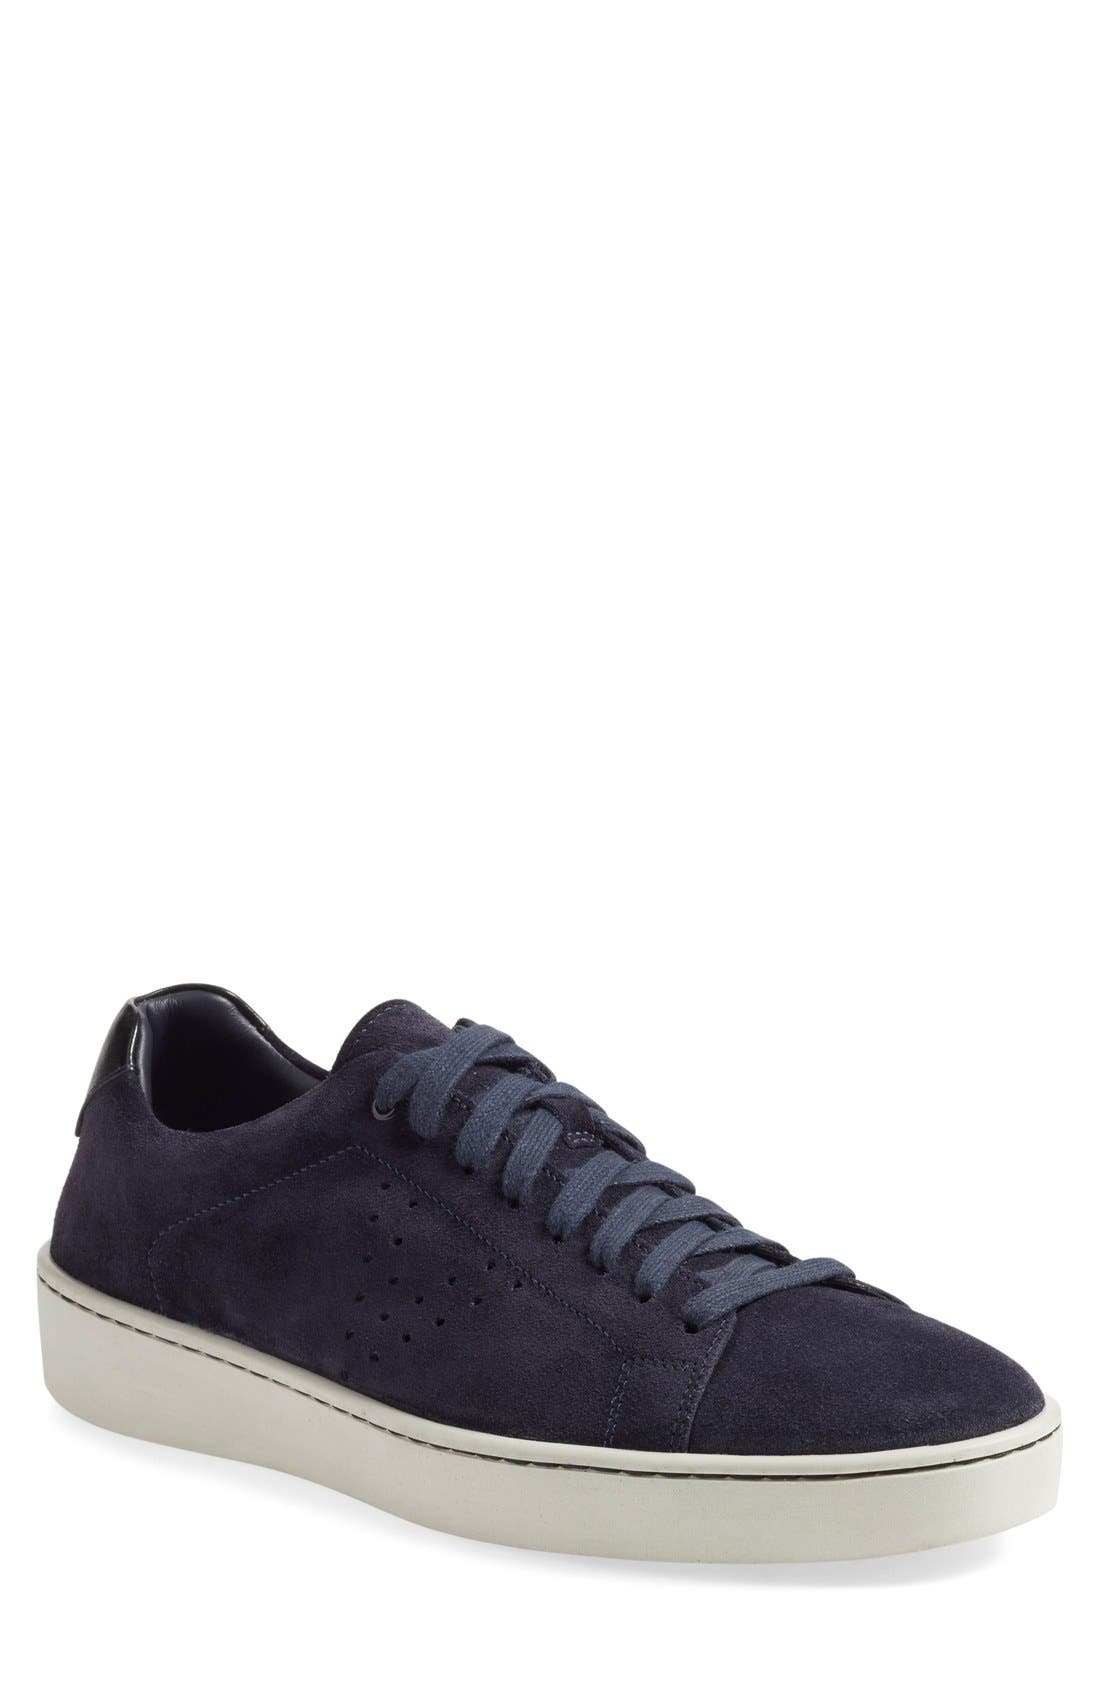 'Simon' Perforated Sneaker, Main, color, 407